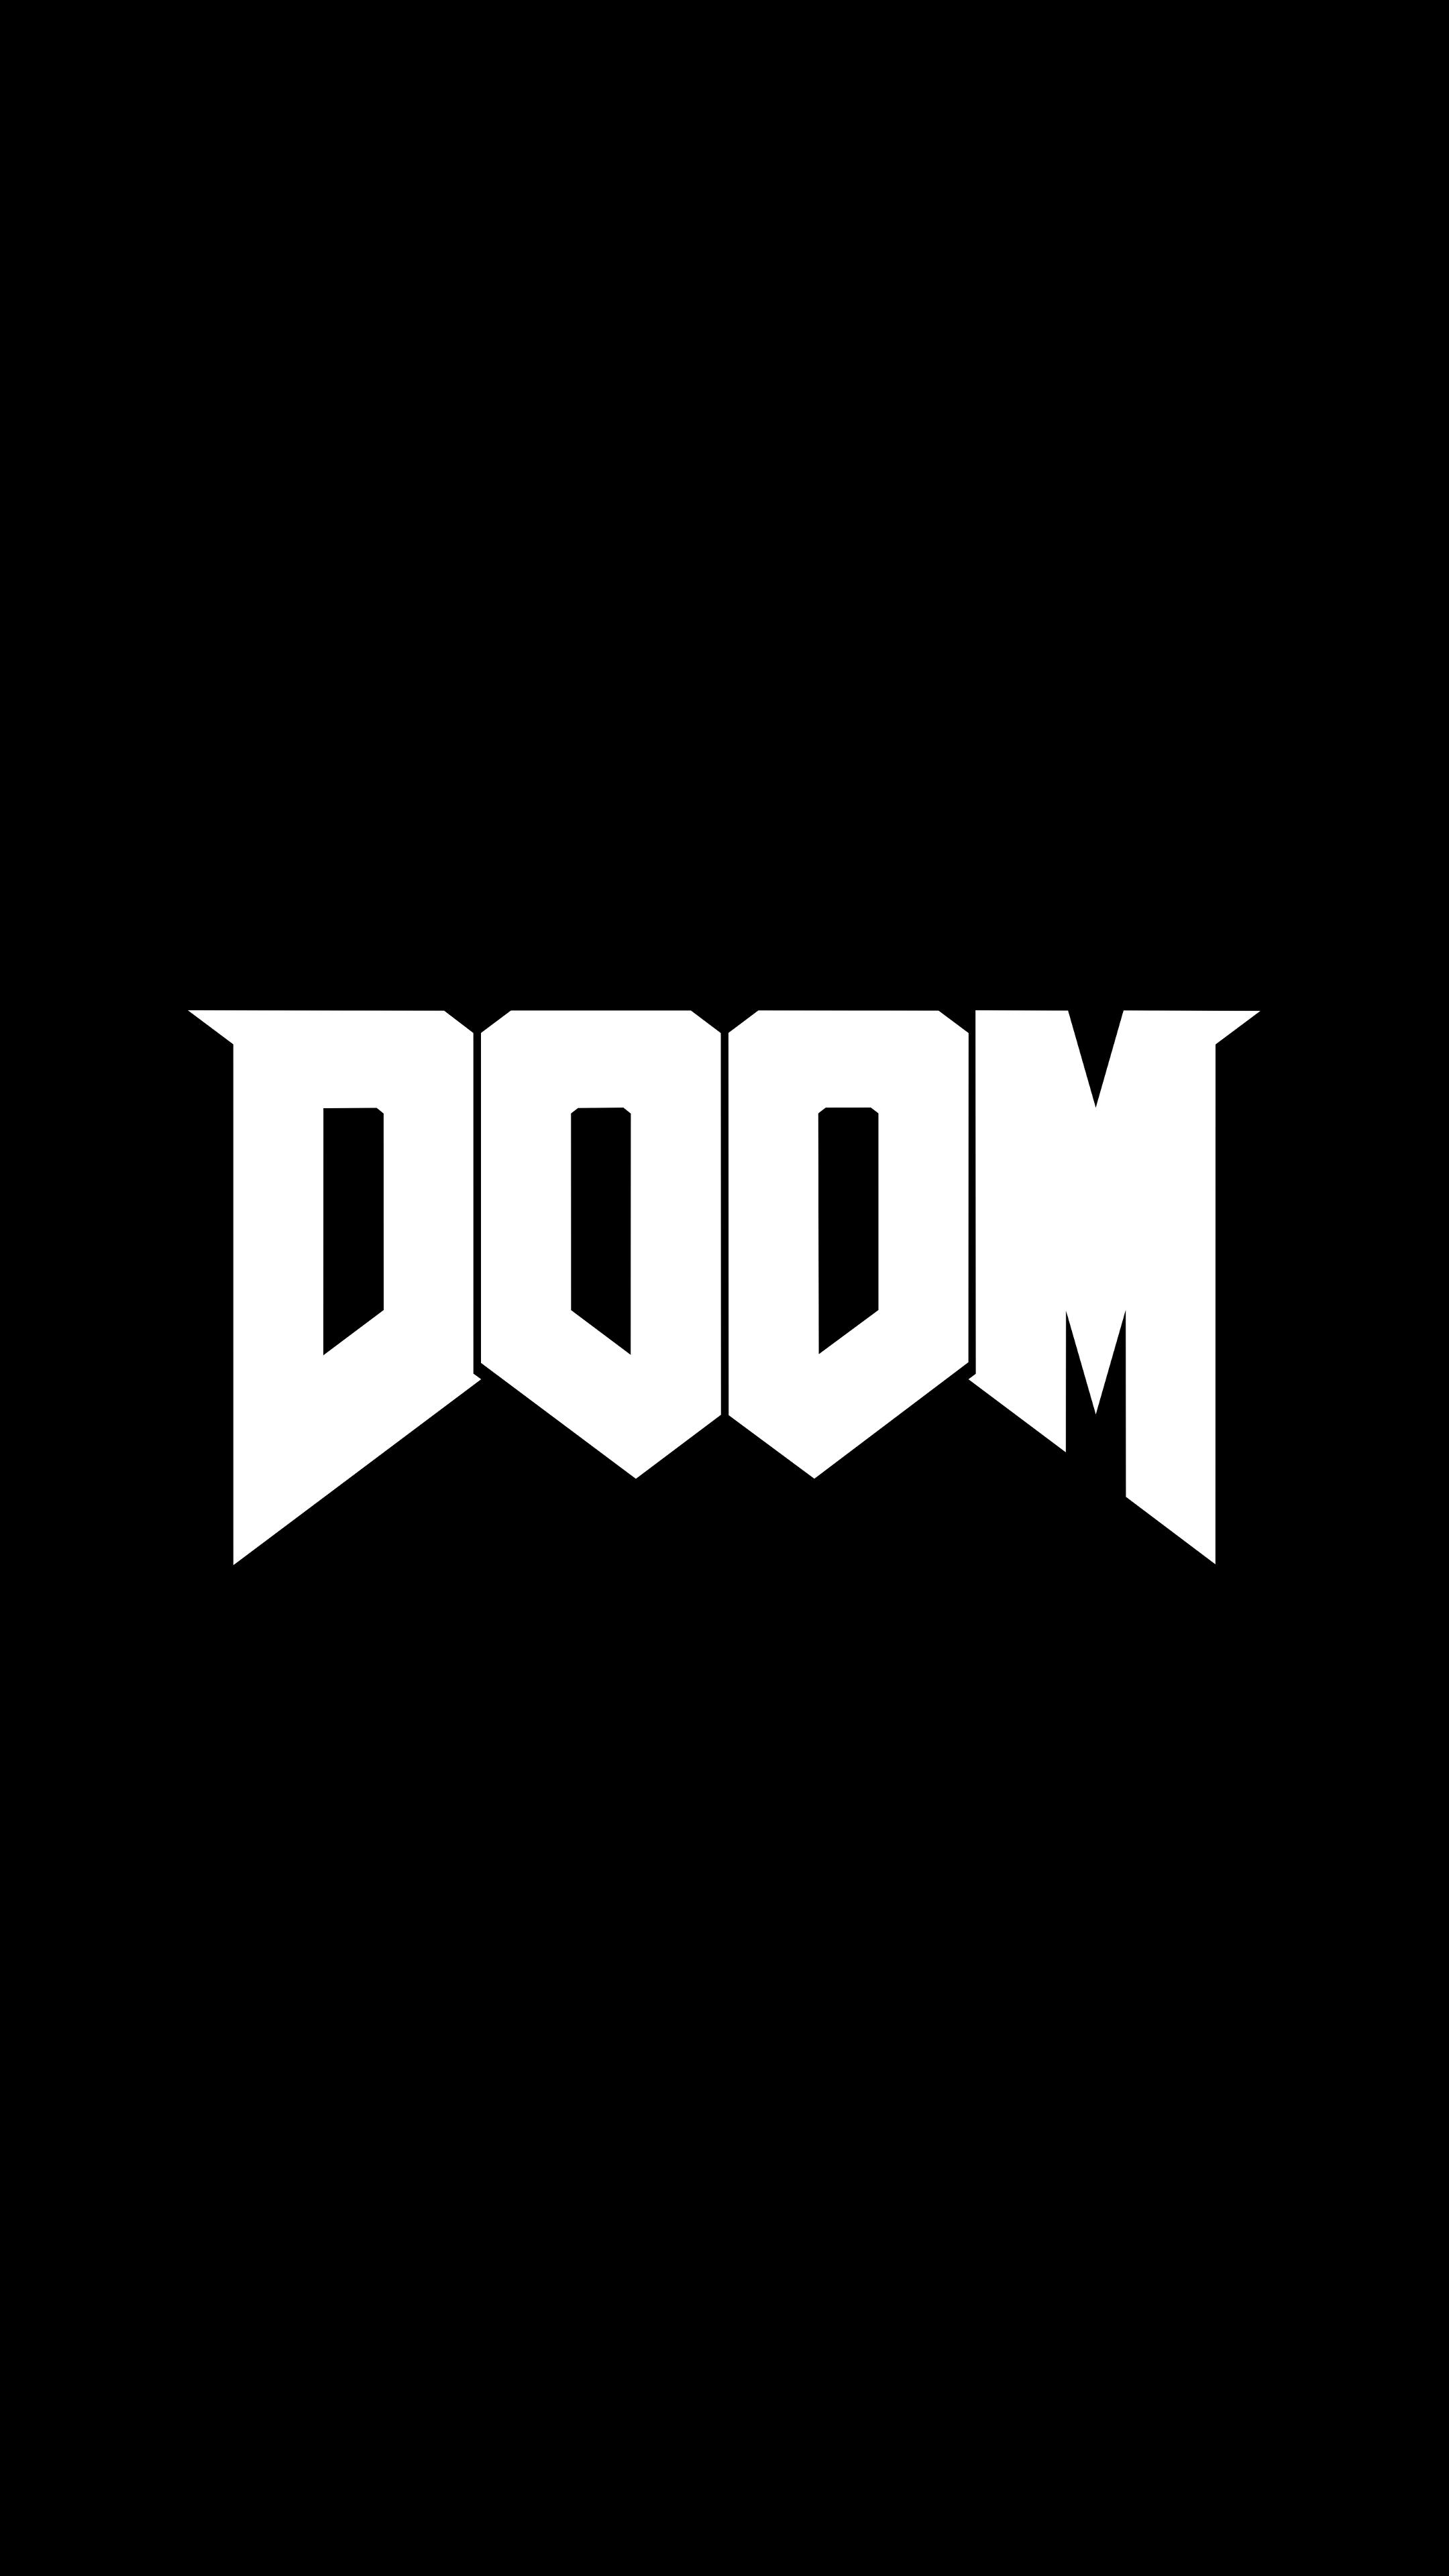 Doom 2016 logo.